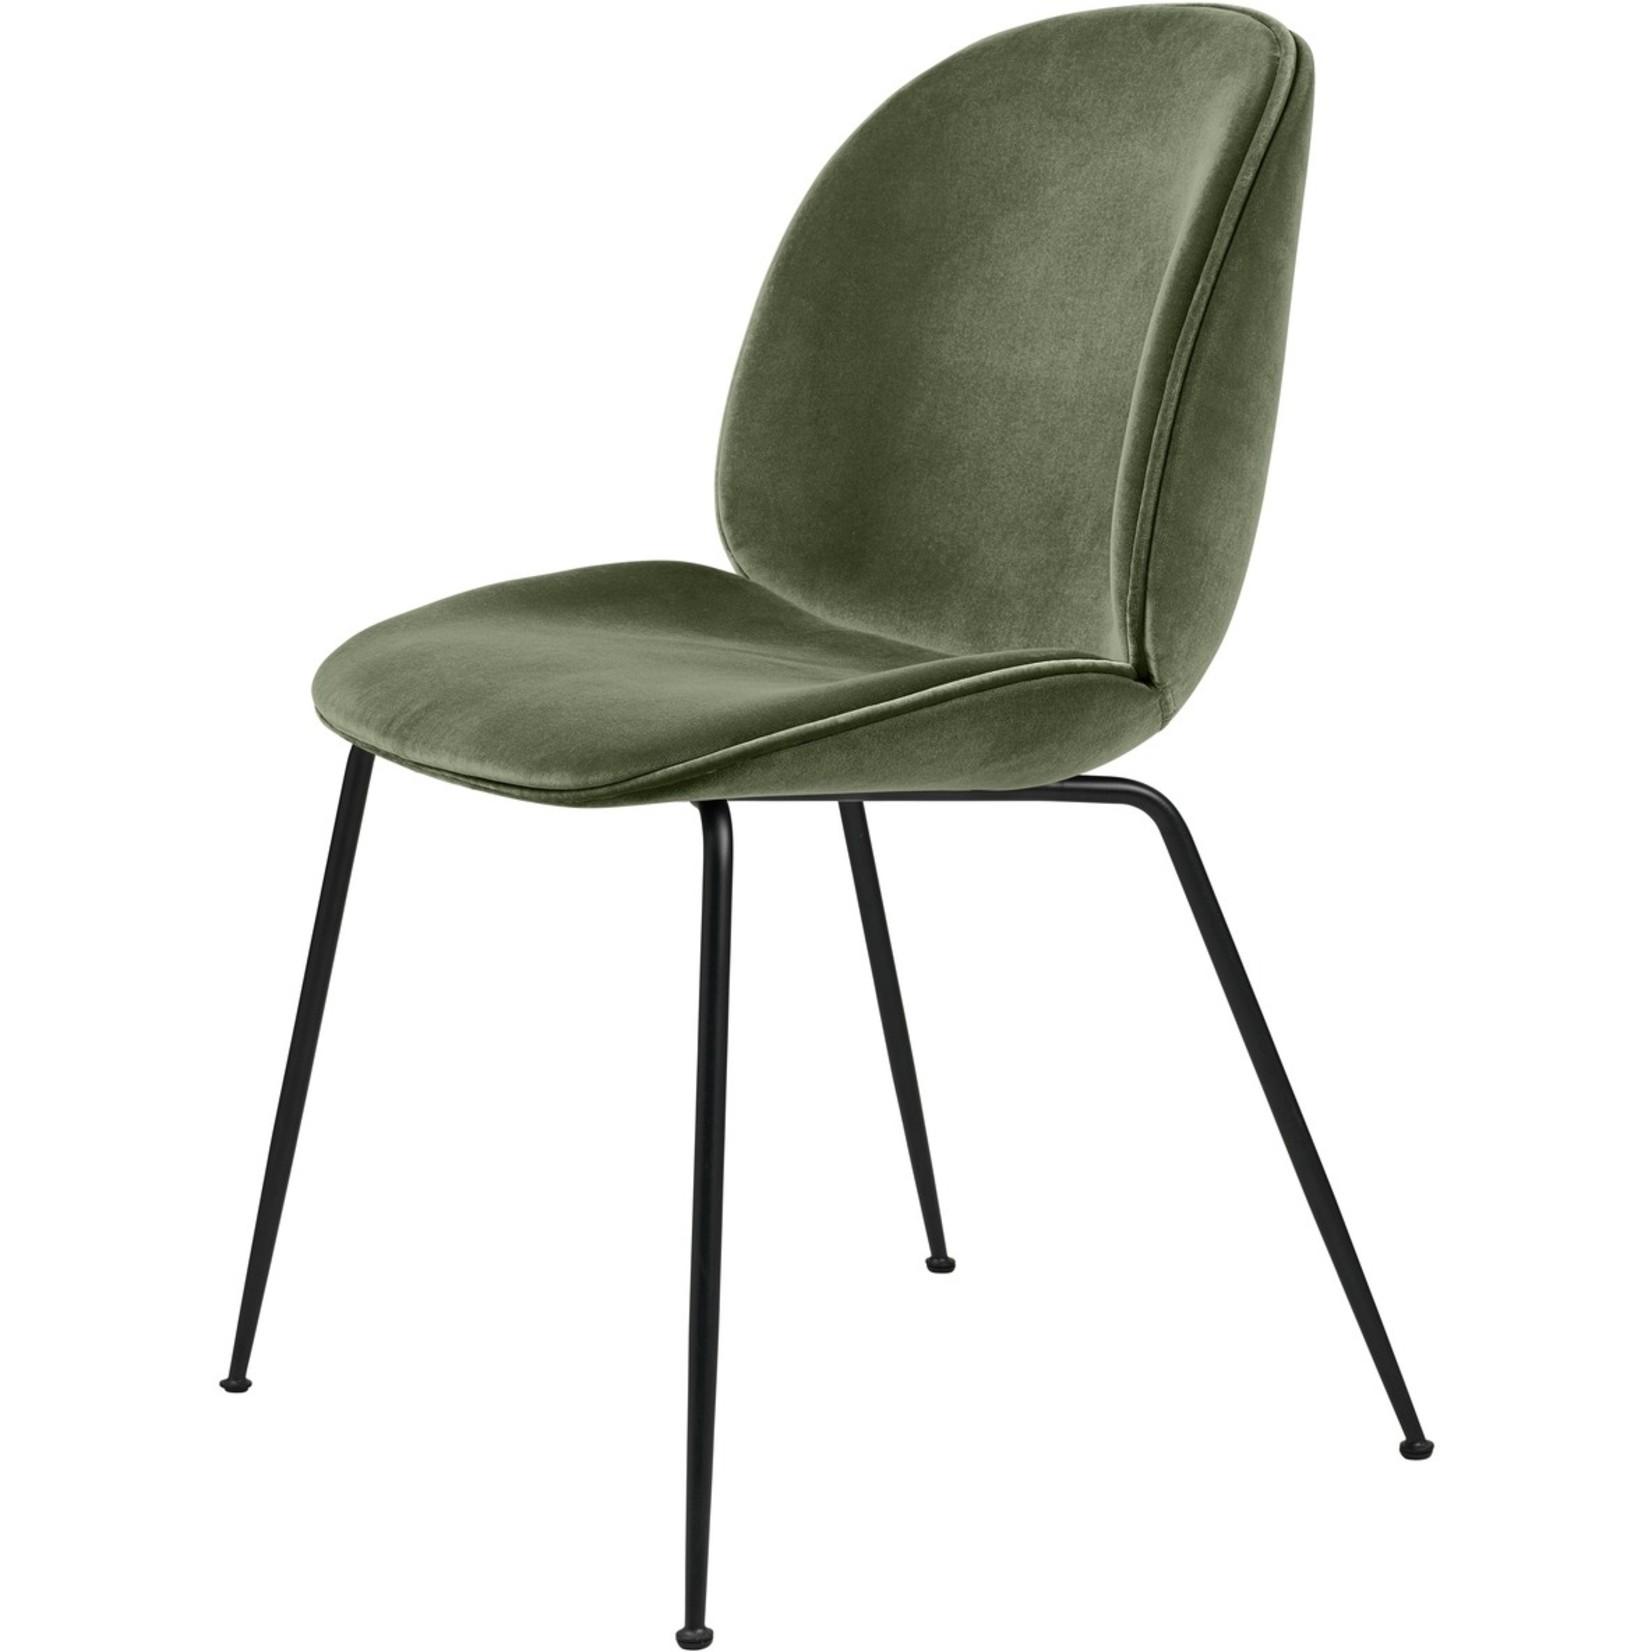 Gubi Beetle Dining Chair | Smokey Green & Black Matt Base